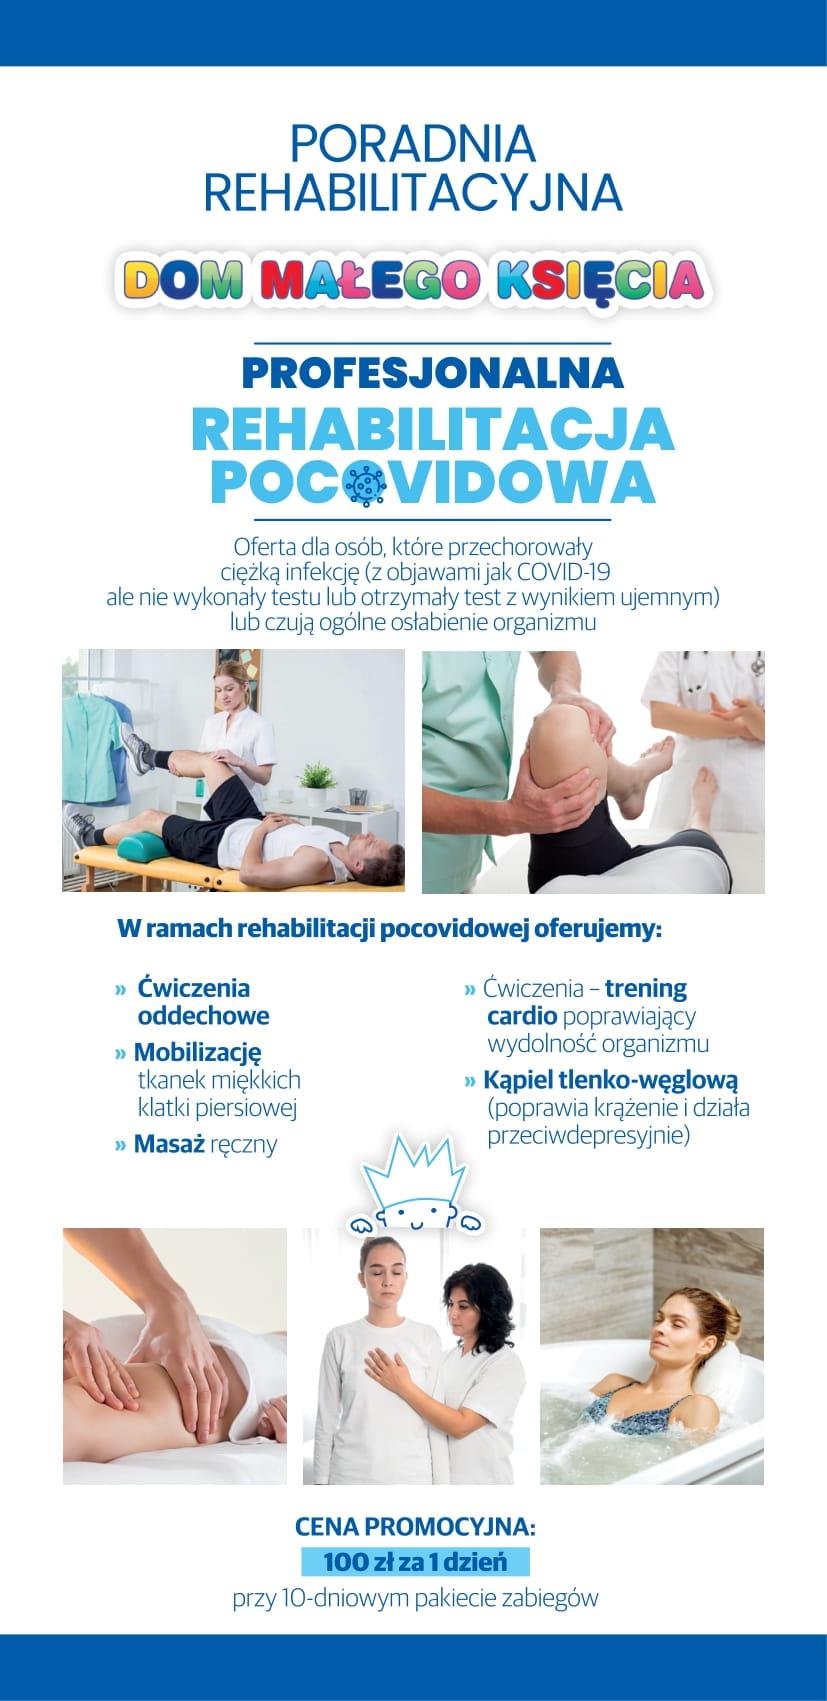 REHABILITACJA Pocovidowa_ulotka 2xDL_v2-1